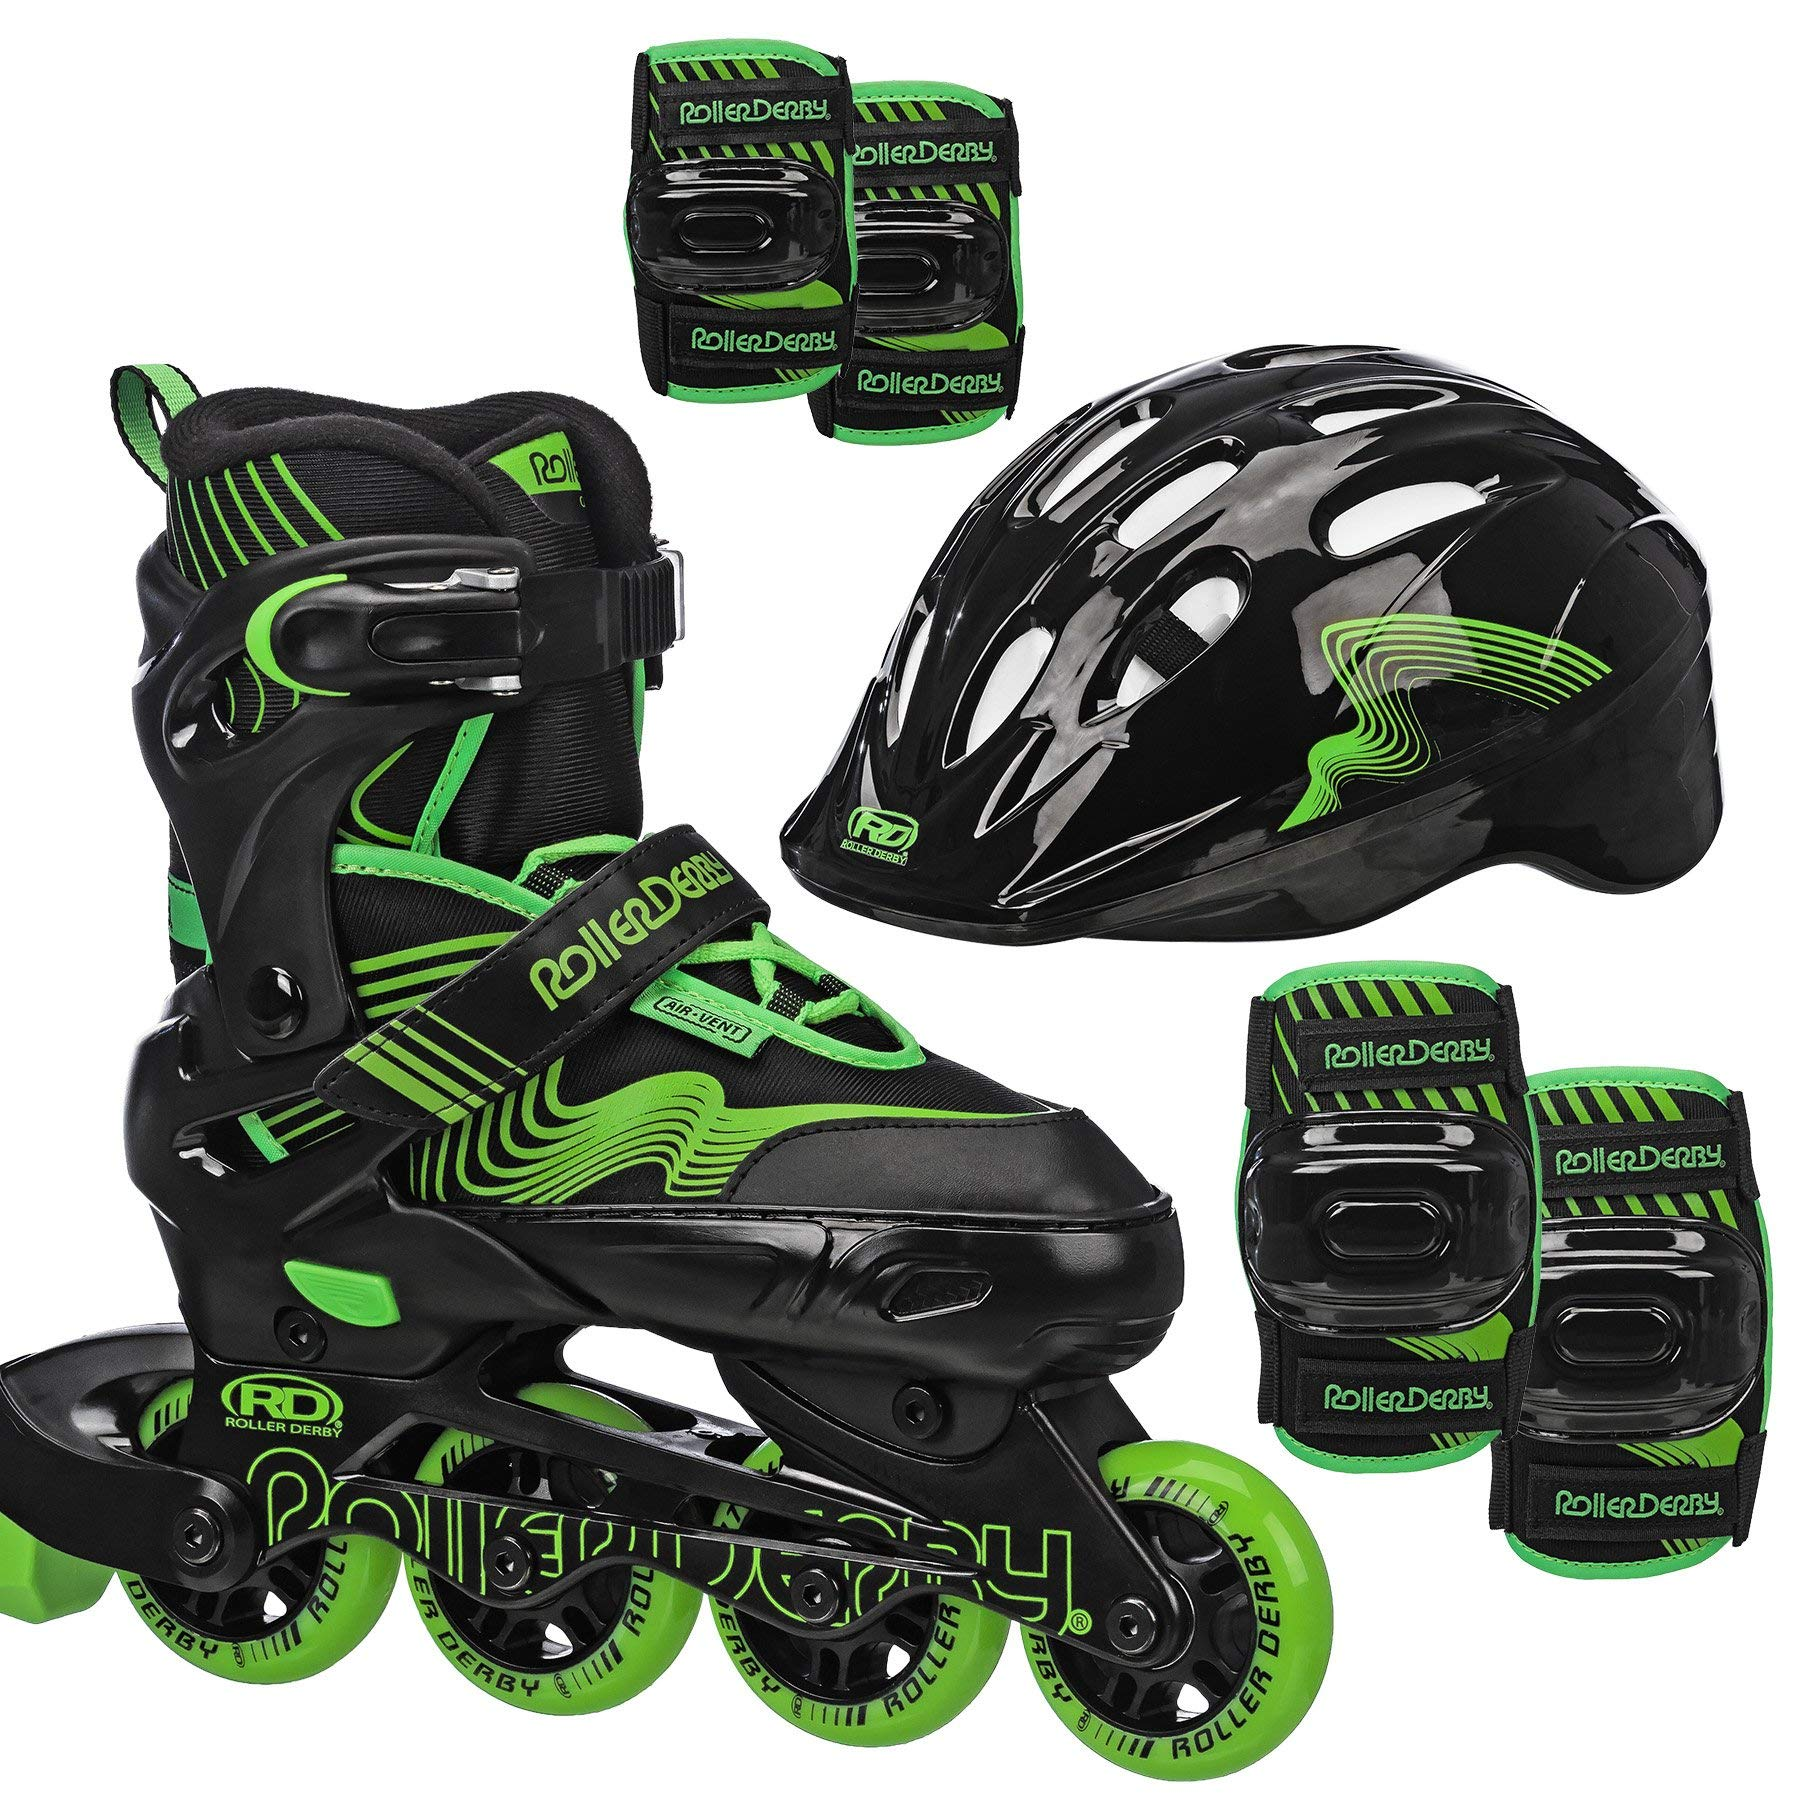 Roller Derby Carver Boys Inline Skates and Protective Pack (Helmet, Elbow Pads, Knee Pads) (Renewed)